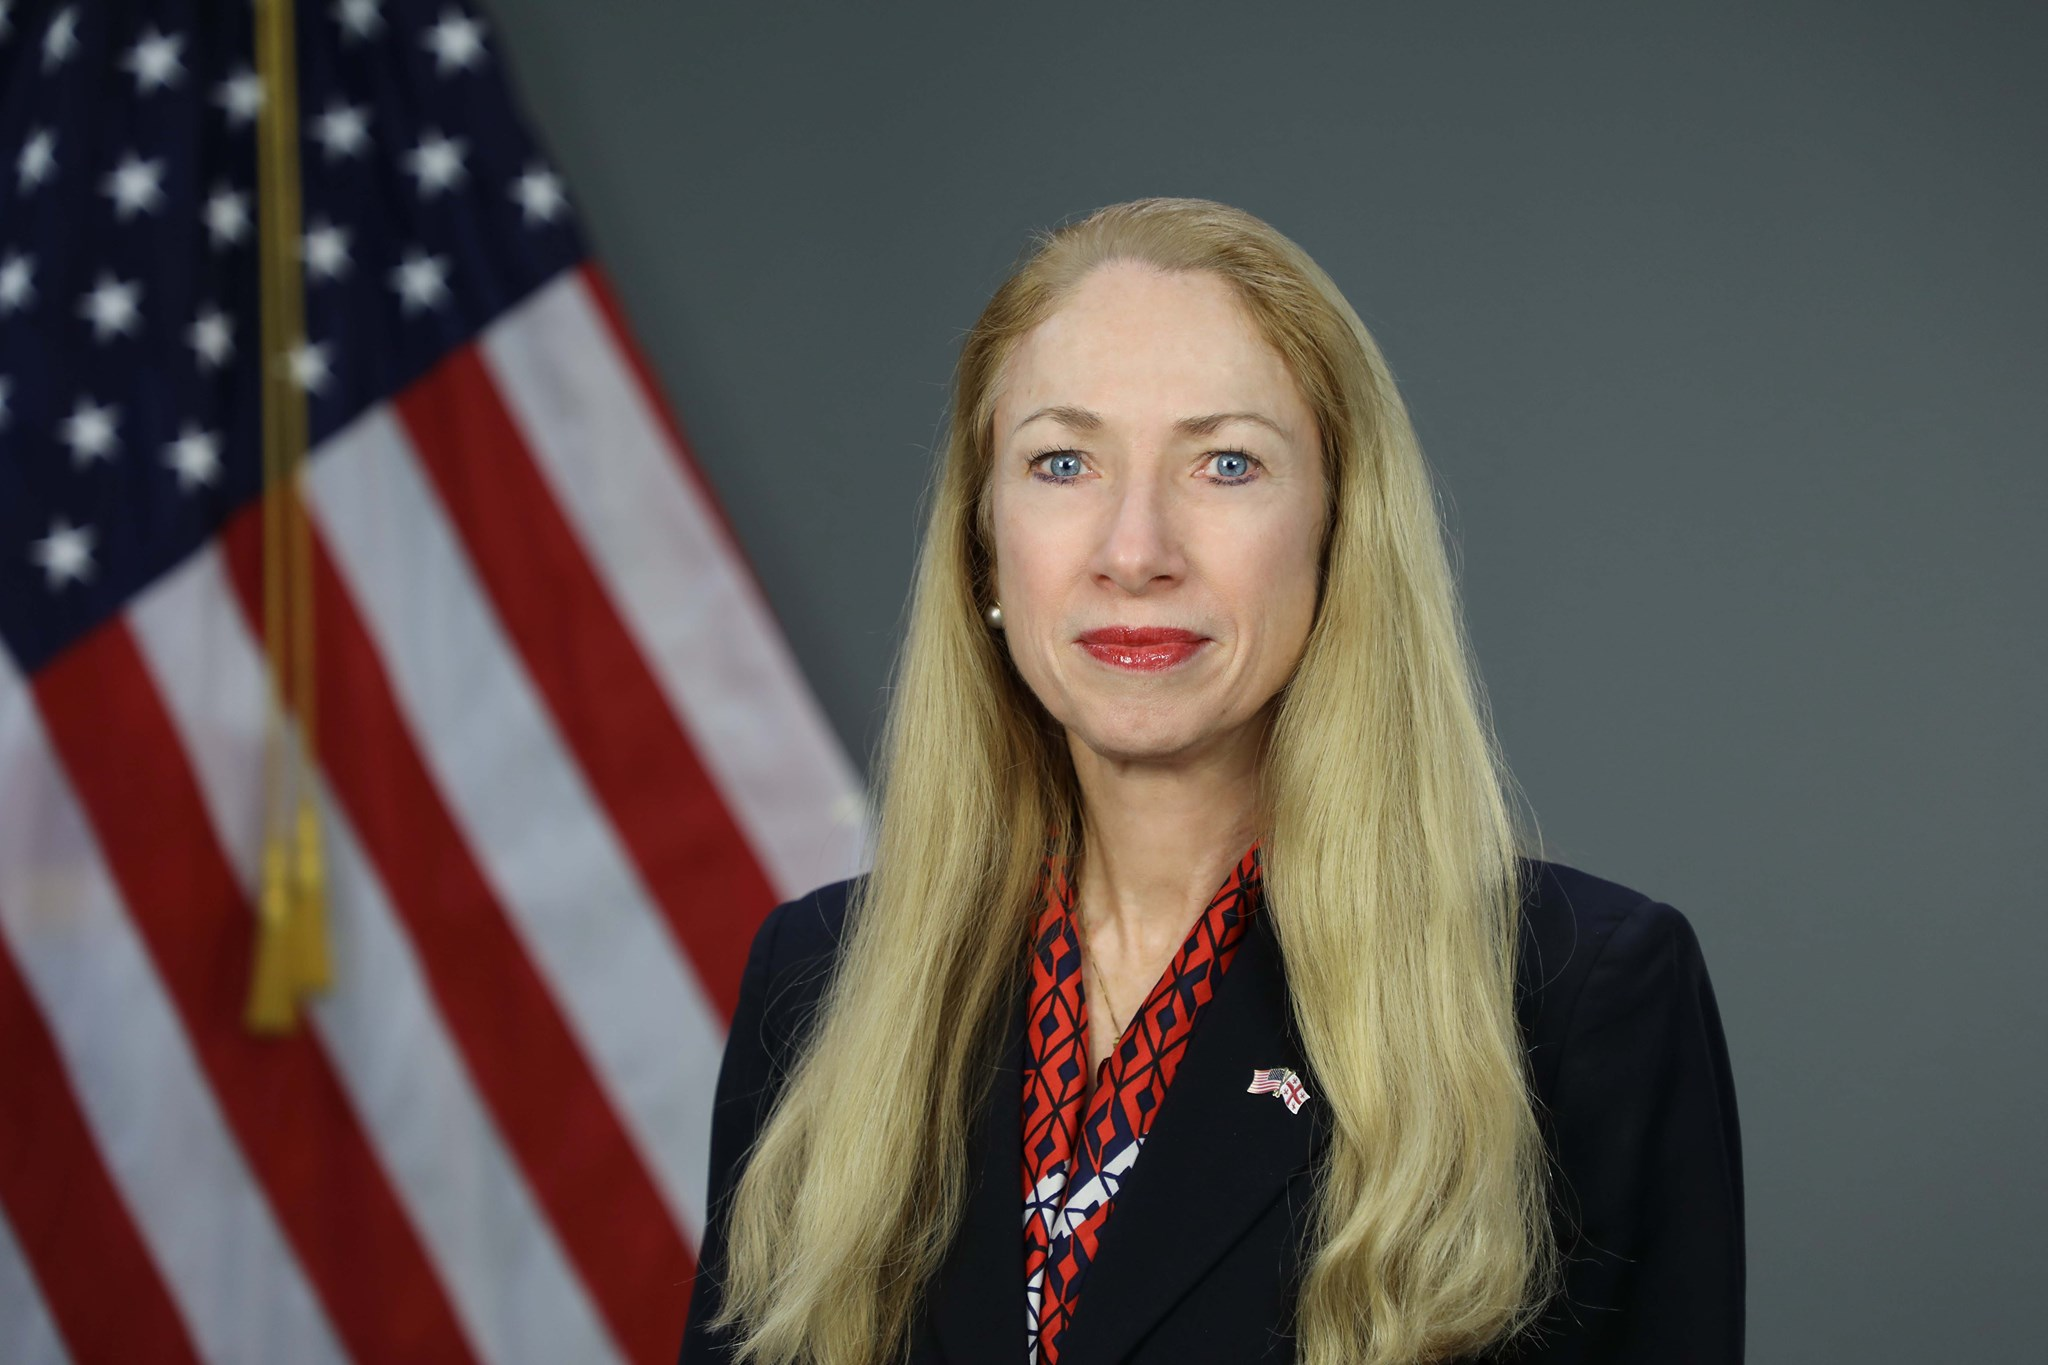 Kelly Degnan #новости Келли Дэгнан, Посол США в Грузии, Тбилиси-Вашингтон